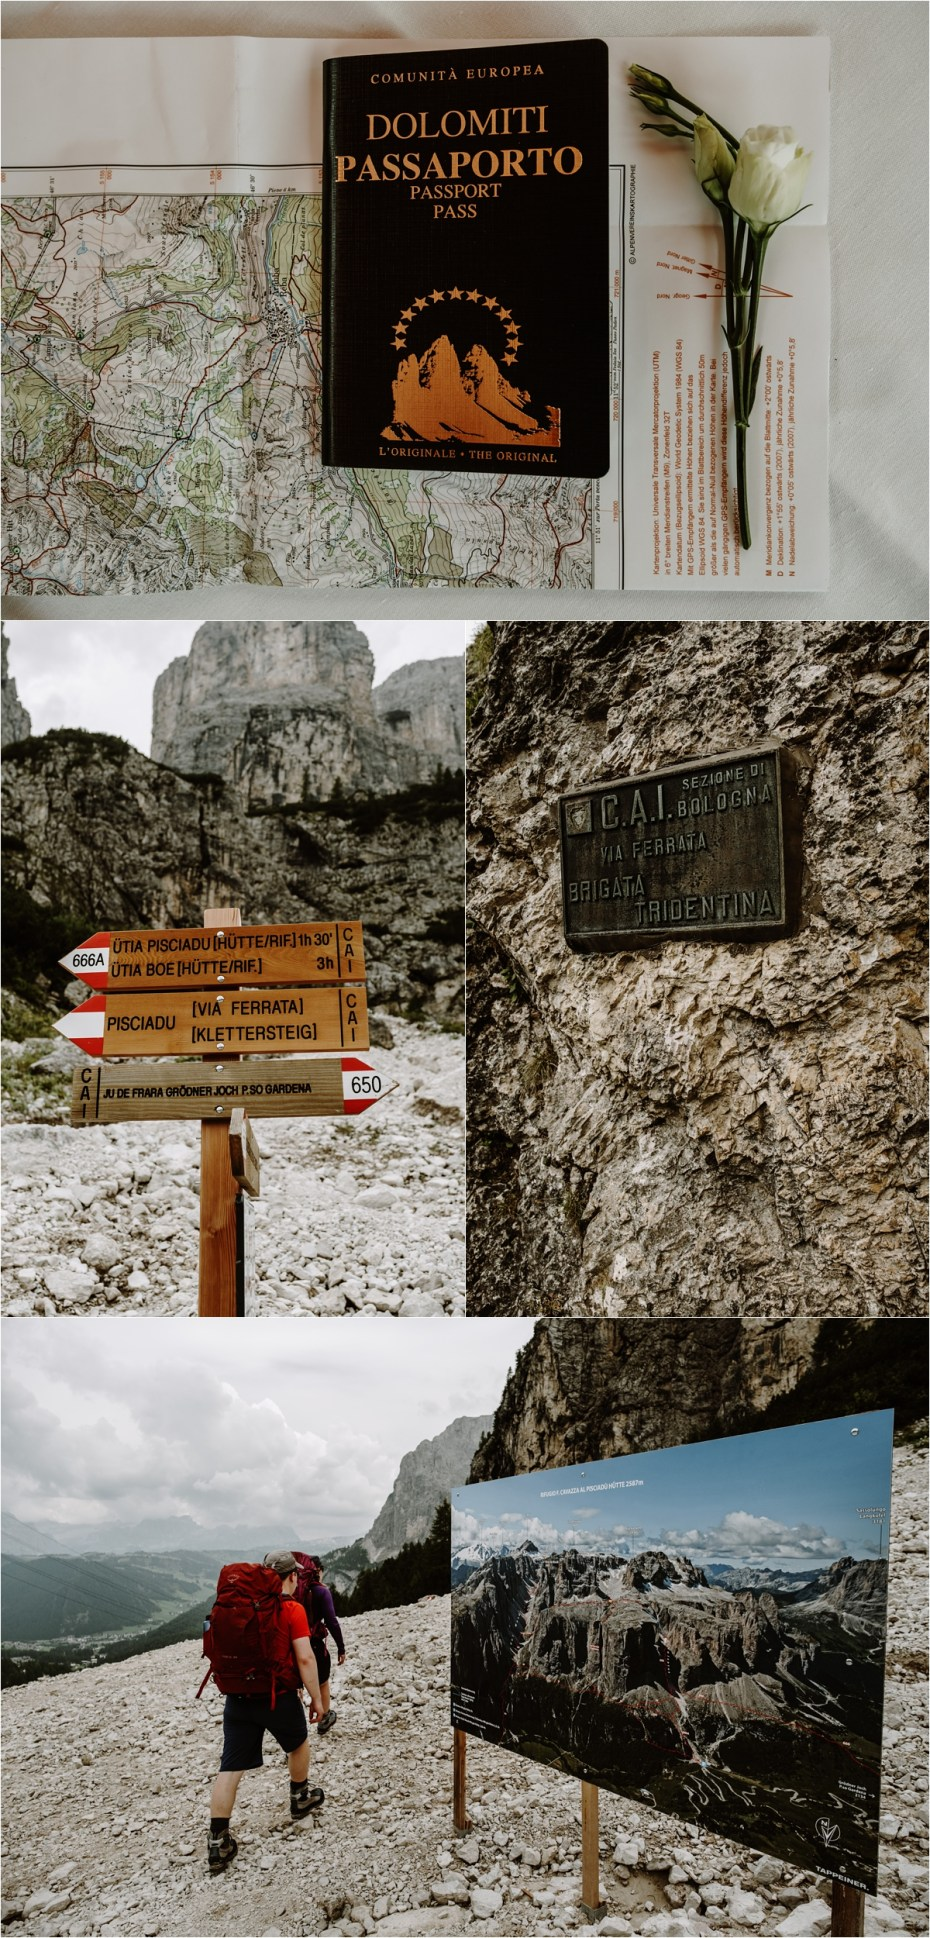 Brigata Tridentina via ferrata in Colfosco. Photo by Wild Connections Photography